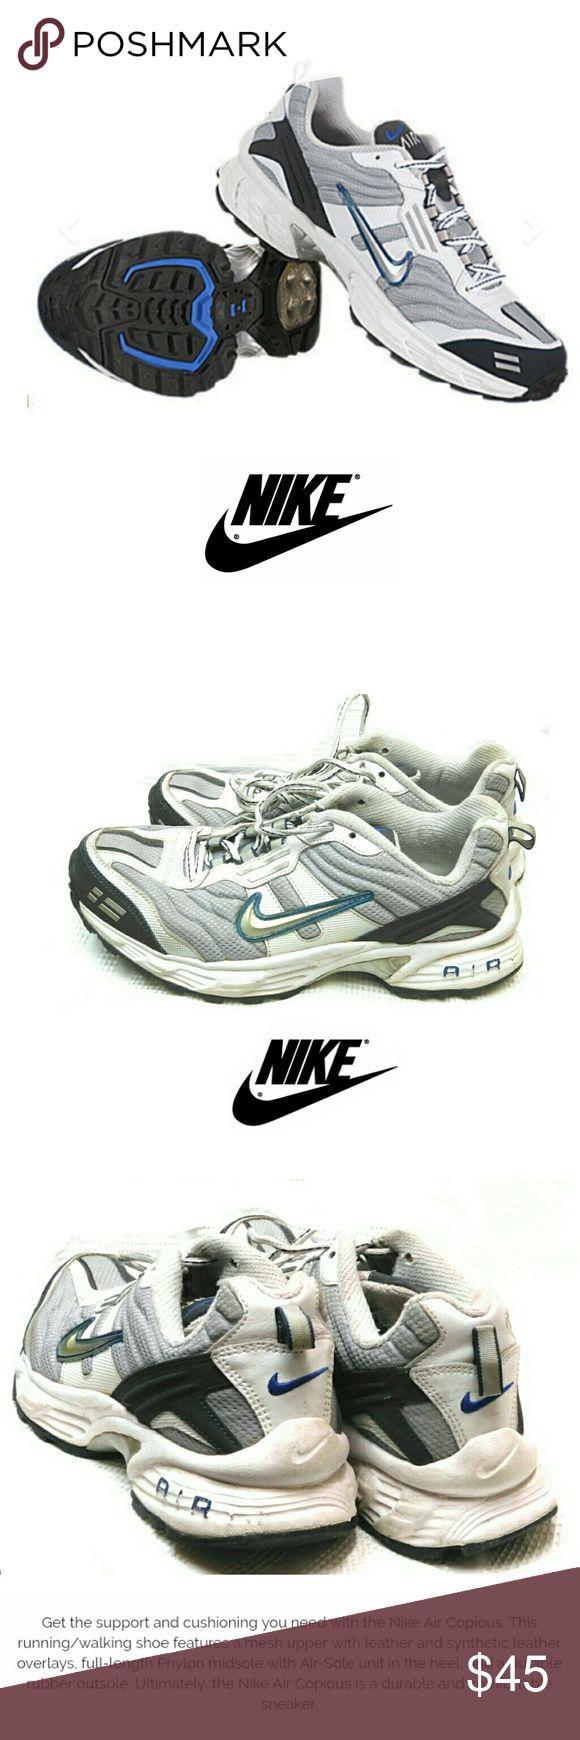 "NIKE AIR COPIOUS RUNNING SNEAKERS NIKE AIR COPIOUS  RUNNING SNEAKERS Pre-Loved  / 10317-001 SZ 8 1/2"" Pls See All Pics. Ask ? If Needed Nike Shoes Sneakers"